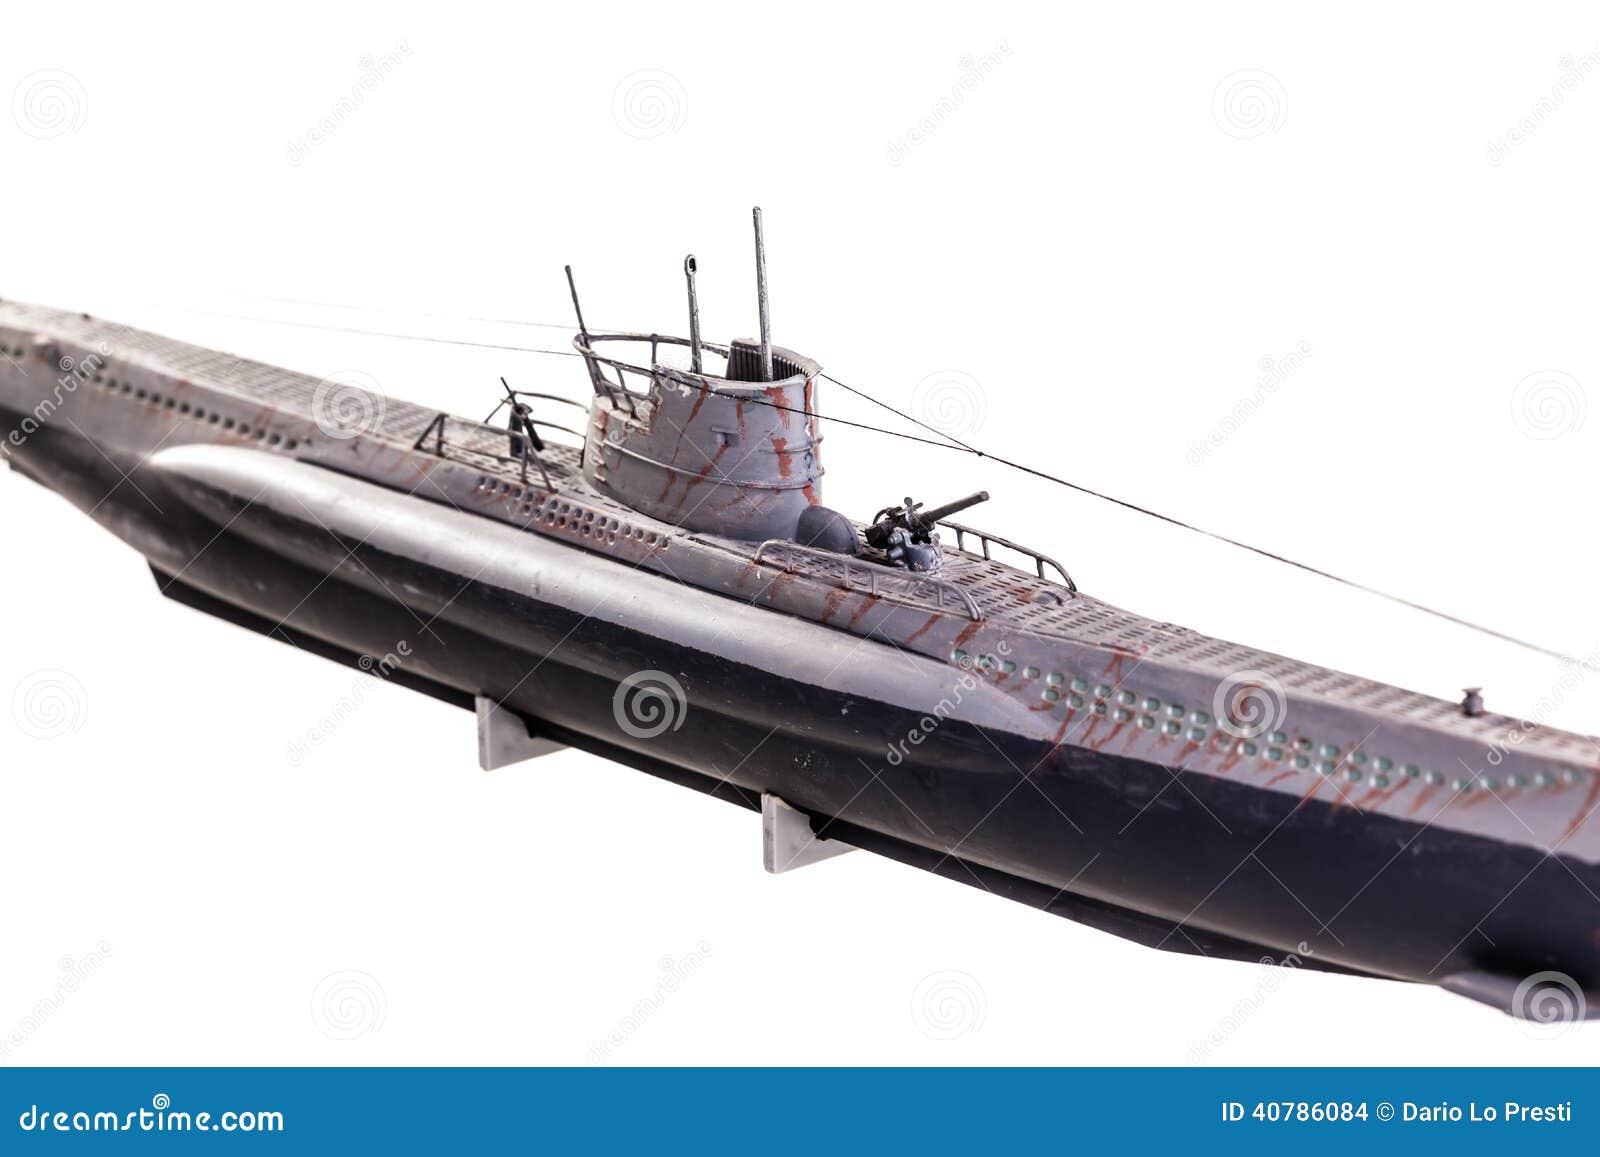 Submarine Stock Photo - Image: 40786084